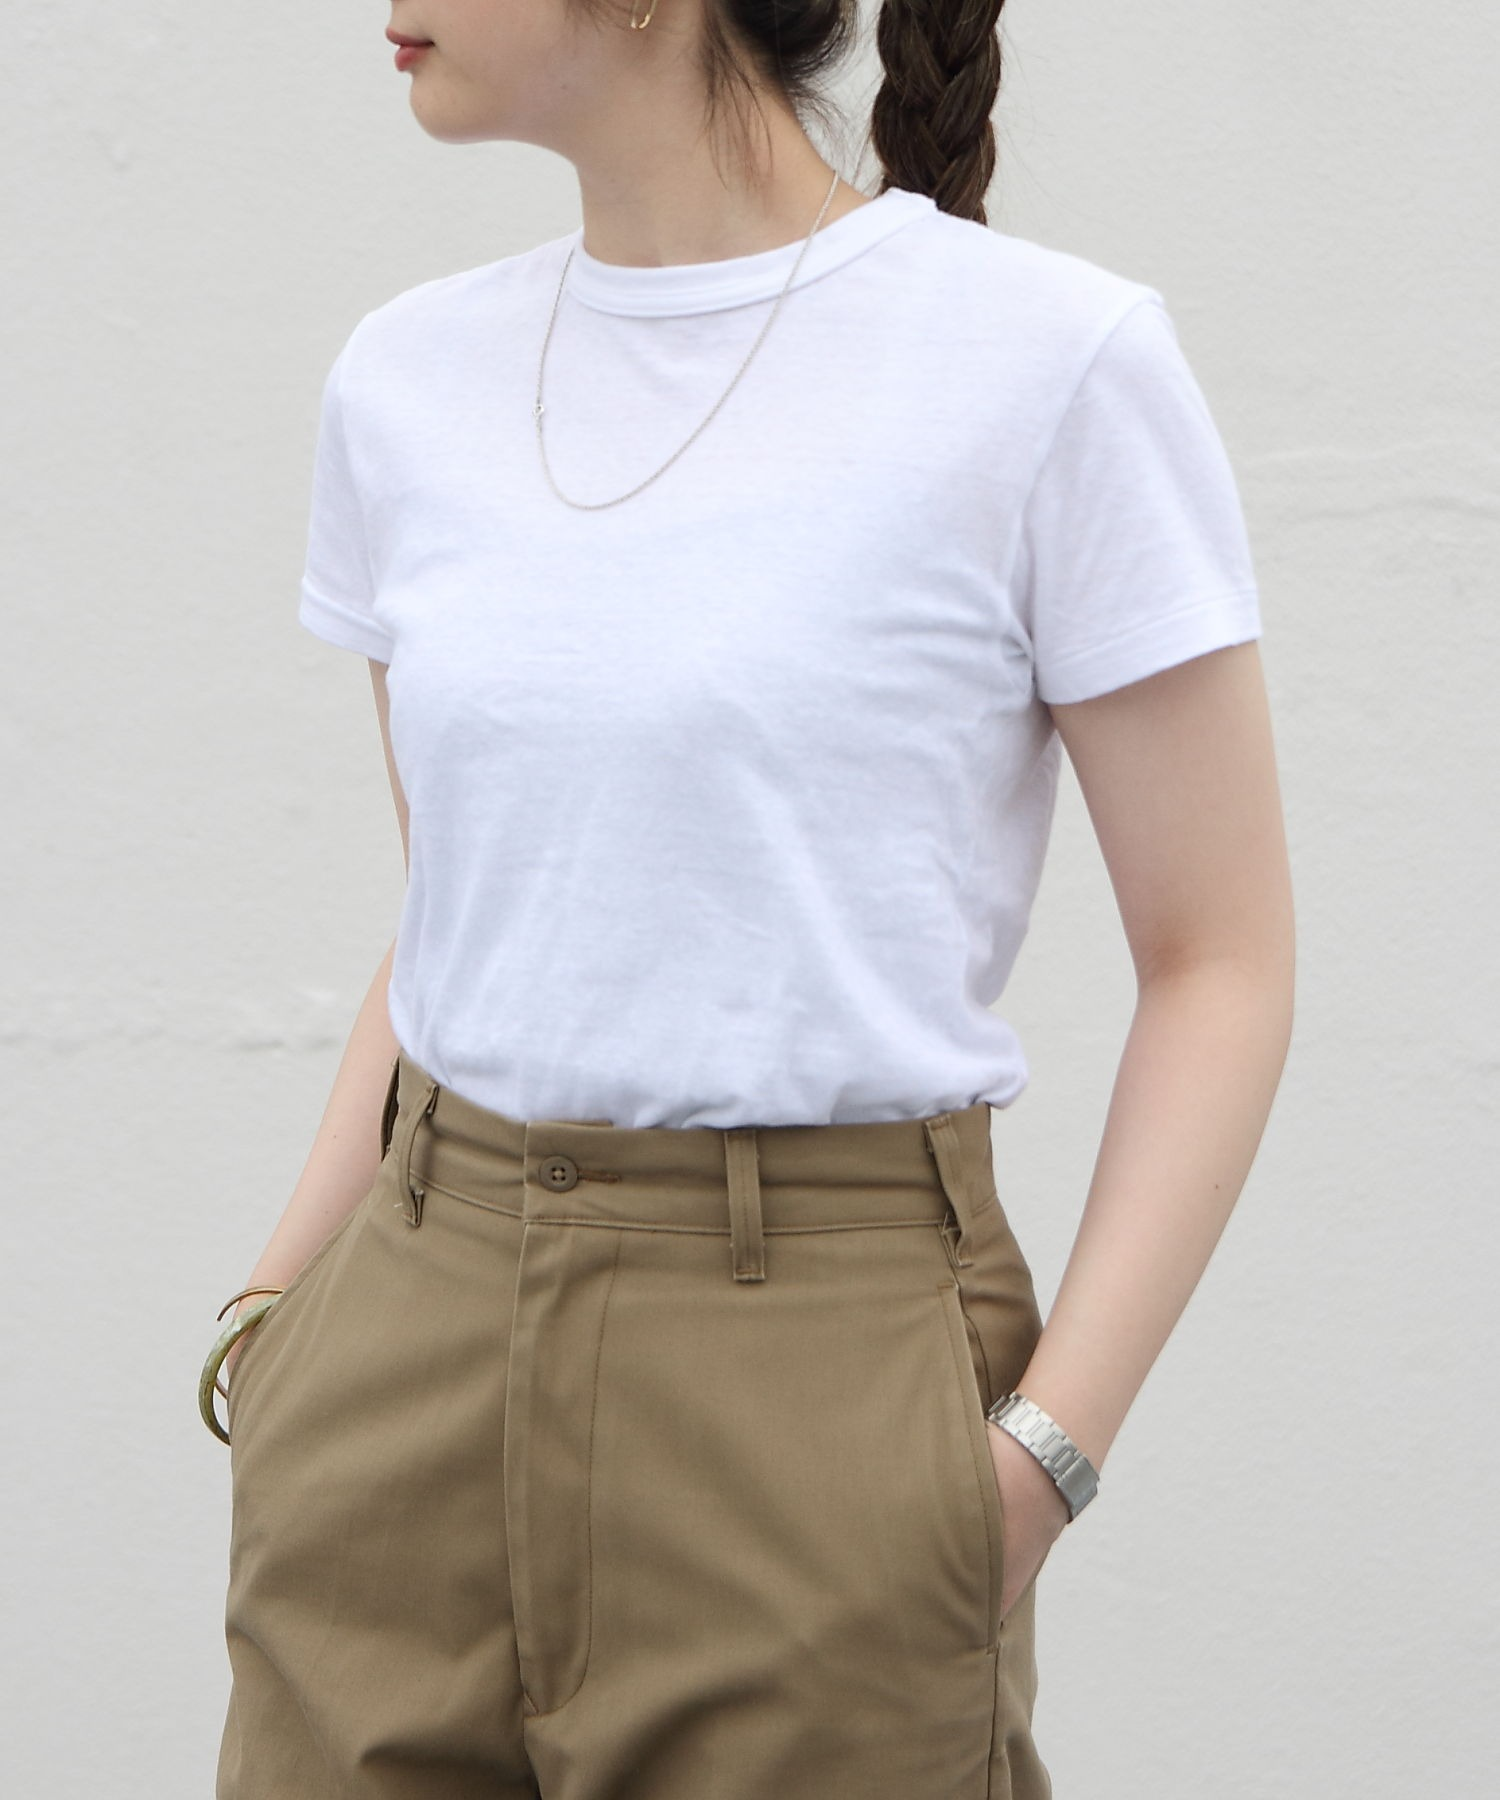 THE SHINZONE/シンゾーン クルーネックTEEシャツ CREW NECK T-SHIRTS